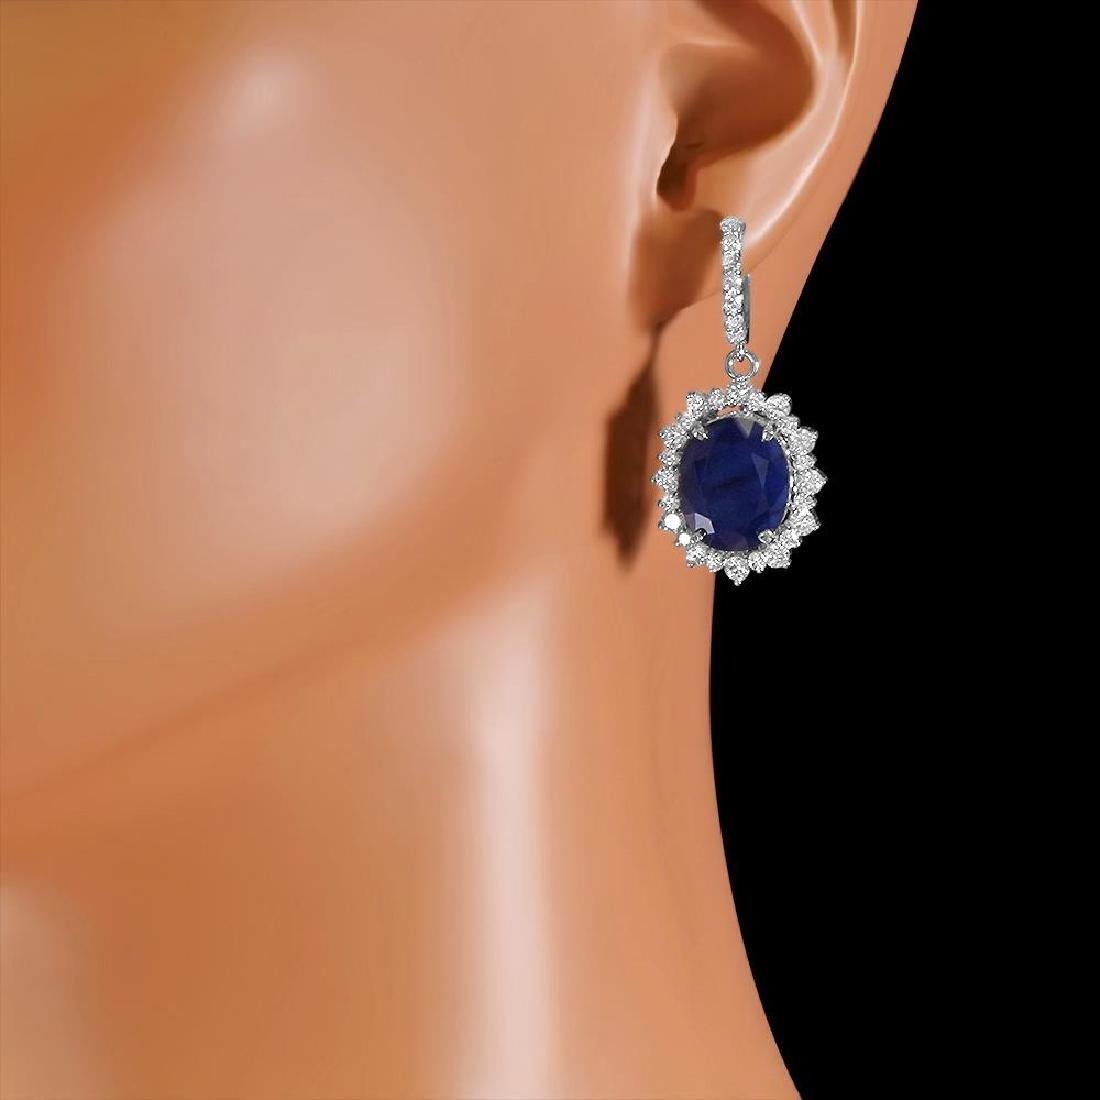 14k Gold 18.89ct Sapphire 3.12ct Diamond Earrings - 2